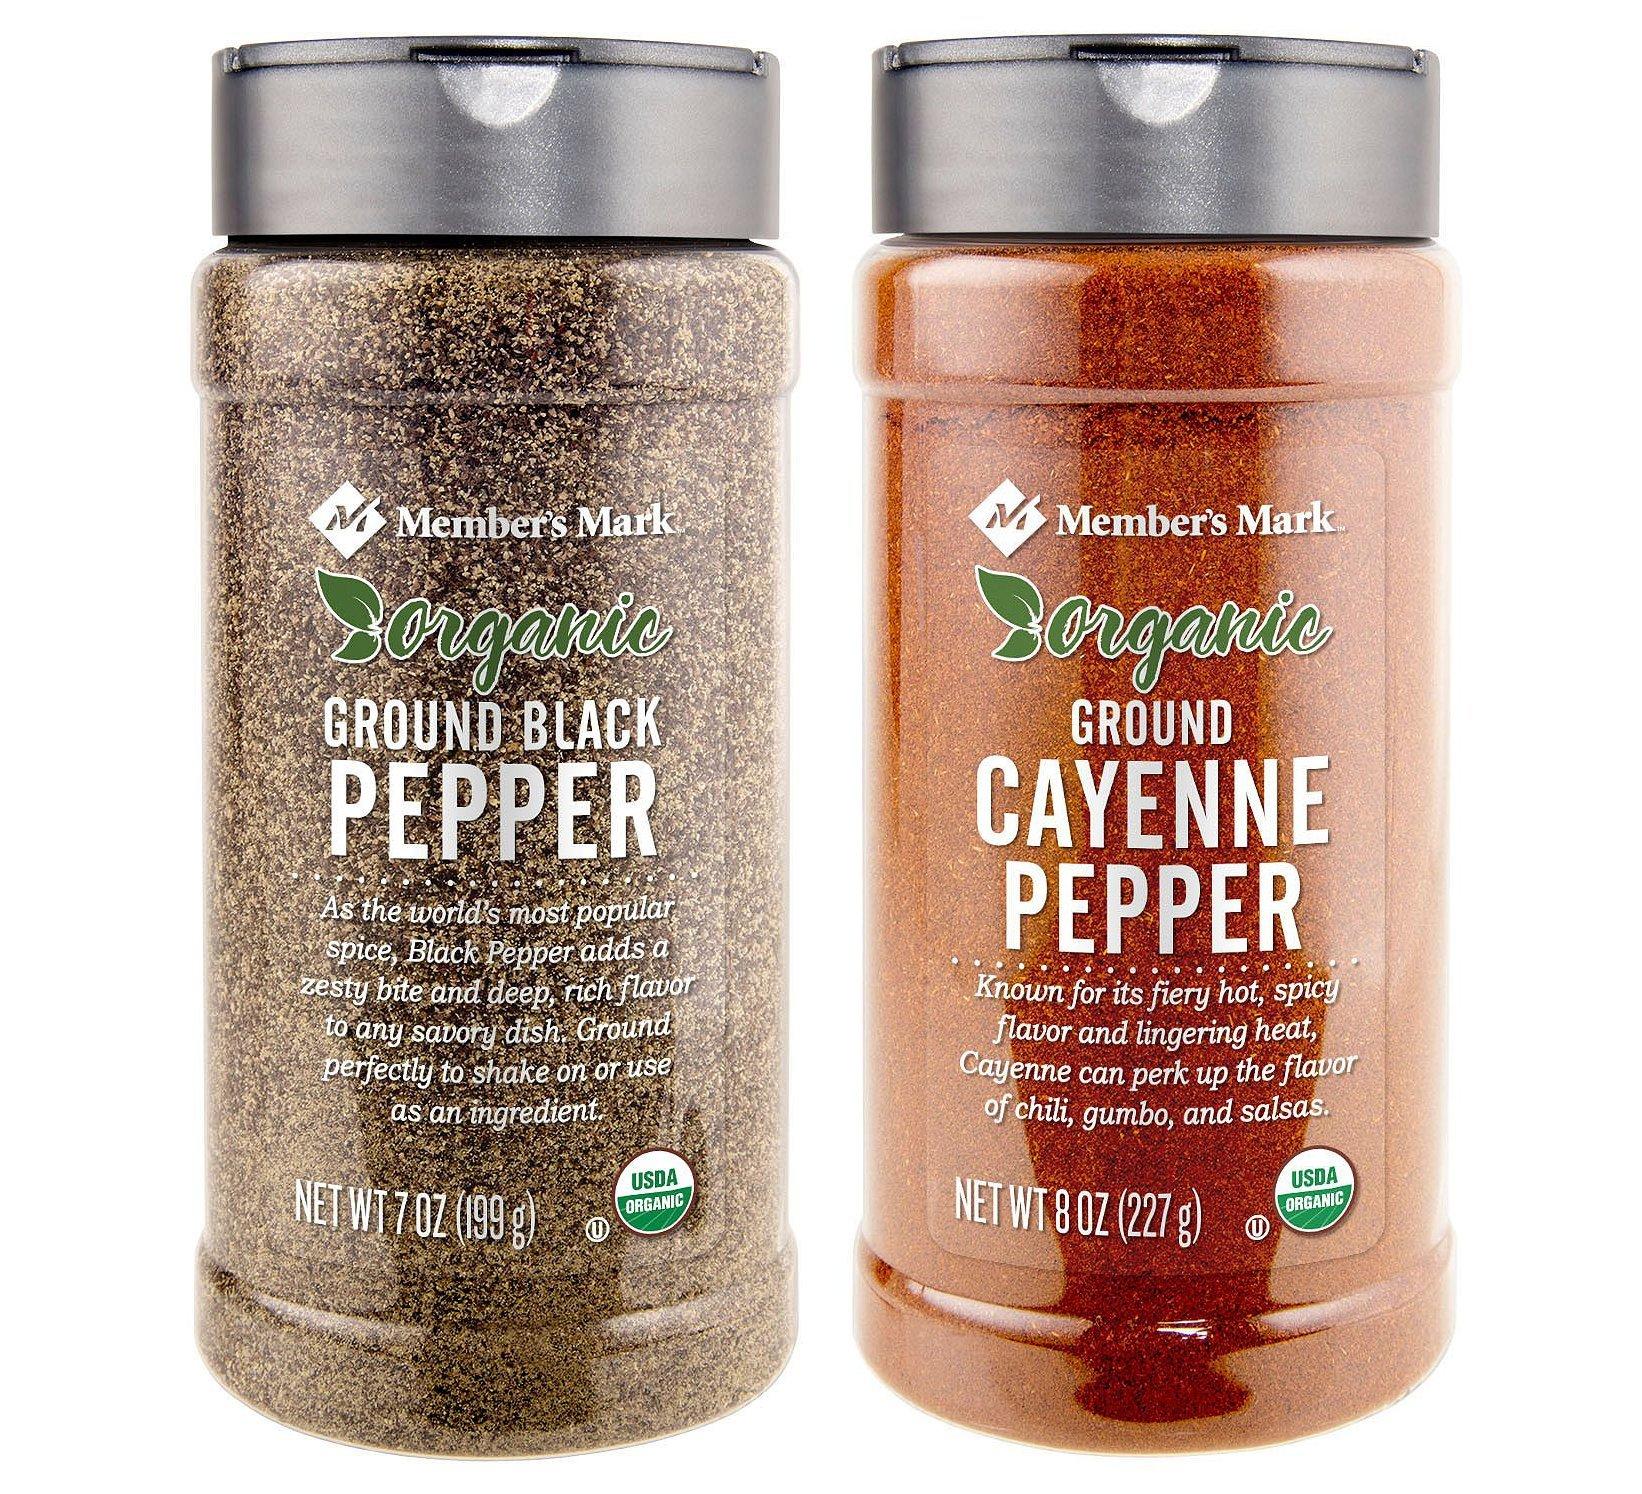 Organic Ground Black Pepper (7 oz.) and Organic Ground Cayenne Pepper (8 oz.) Bundle